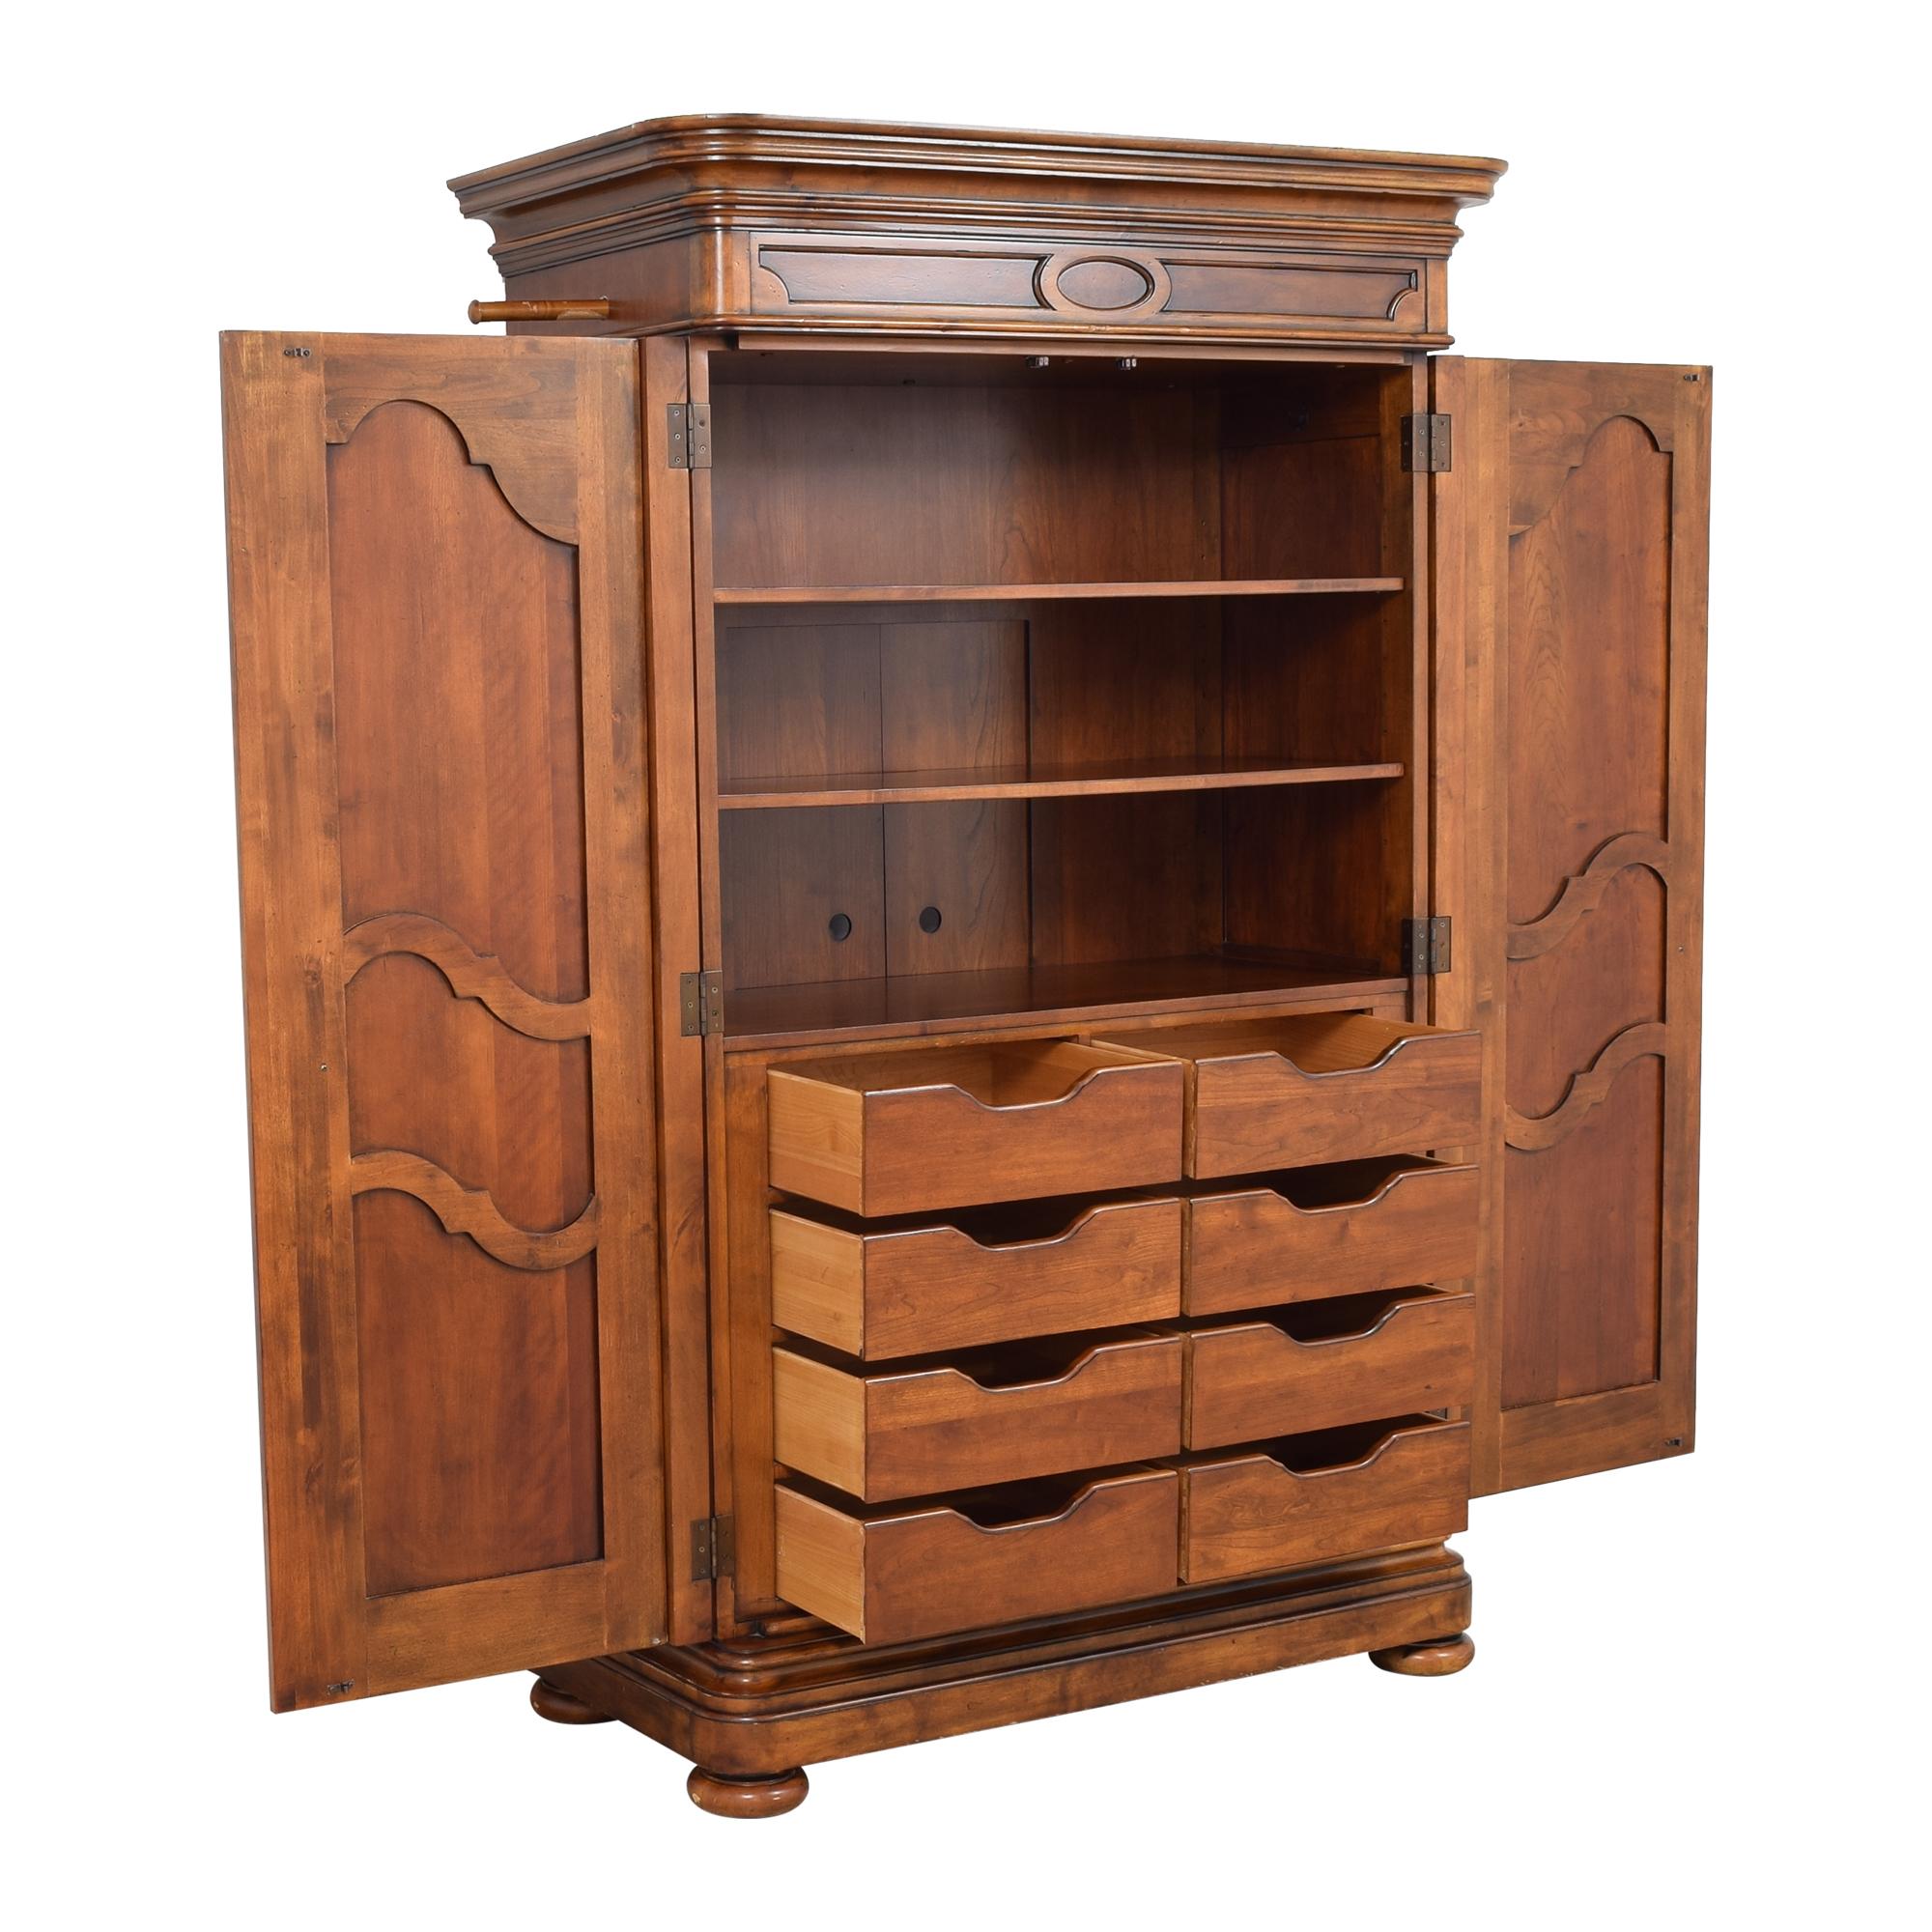 Ethan Allen Ethan Allen Tuscany Armoire Storage